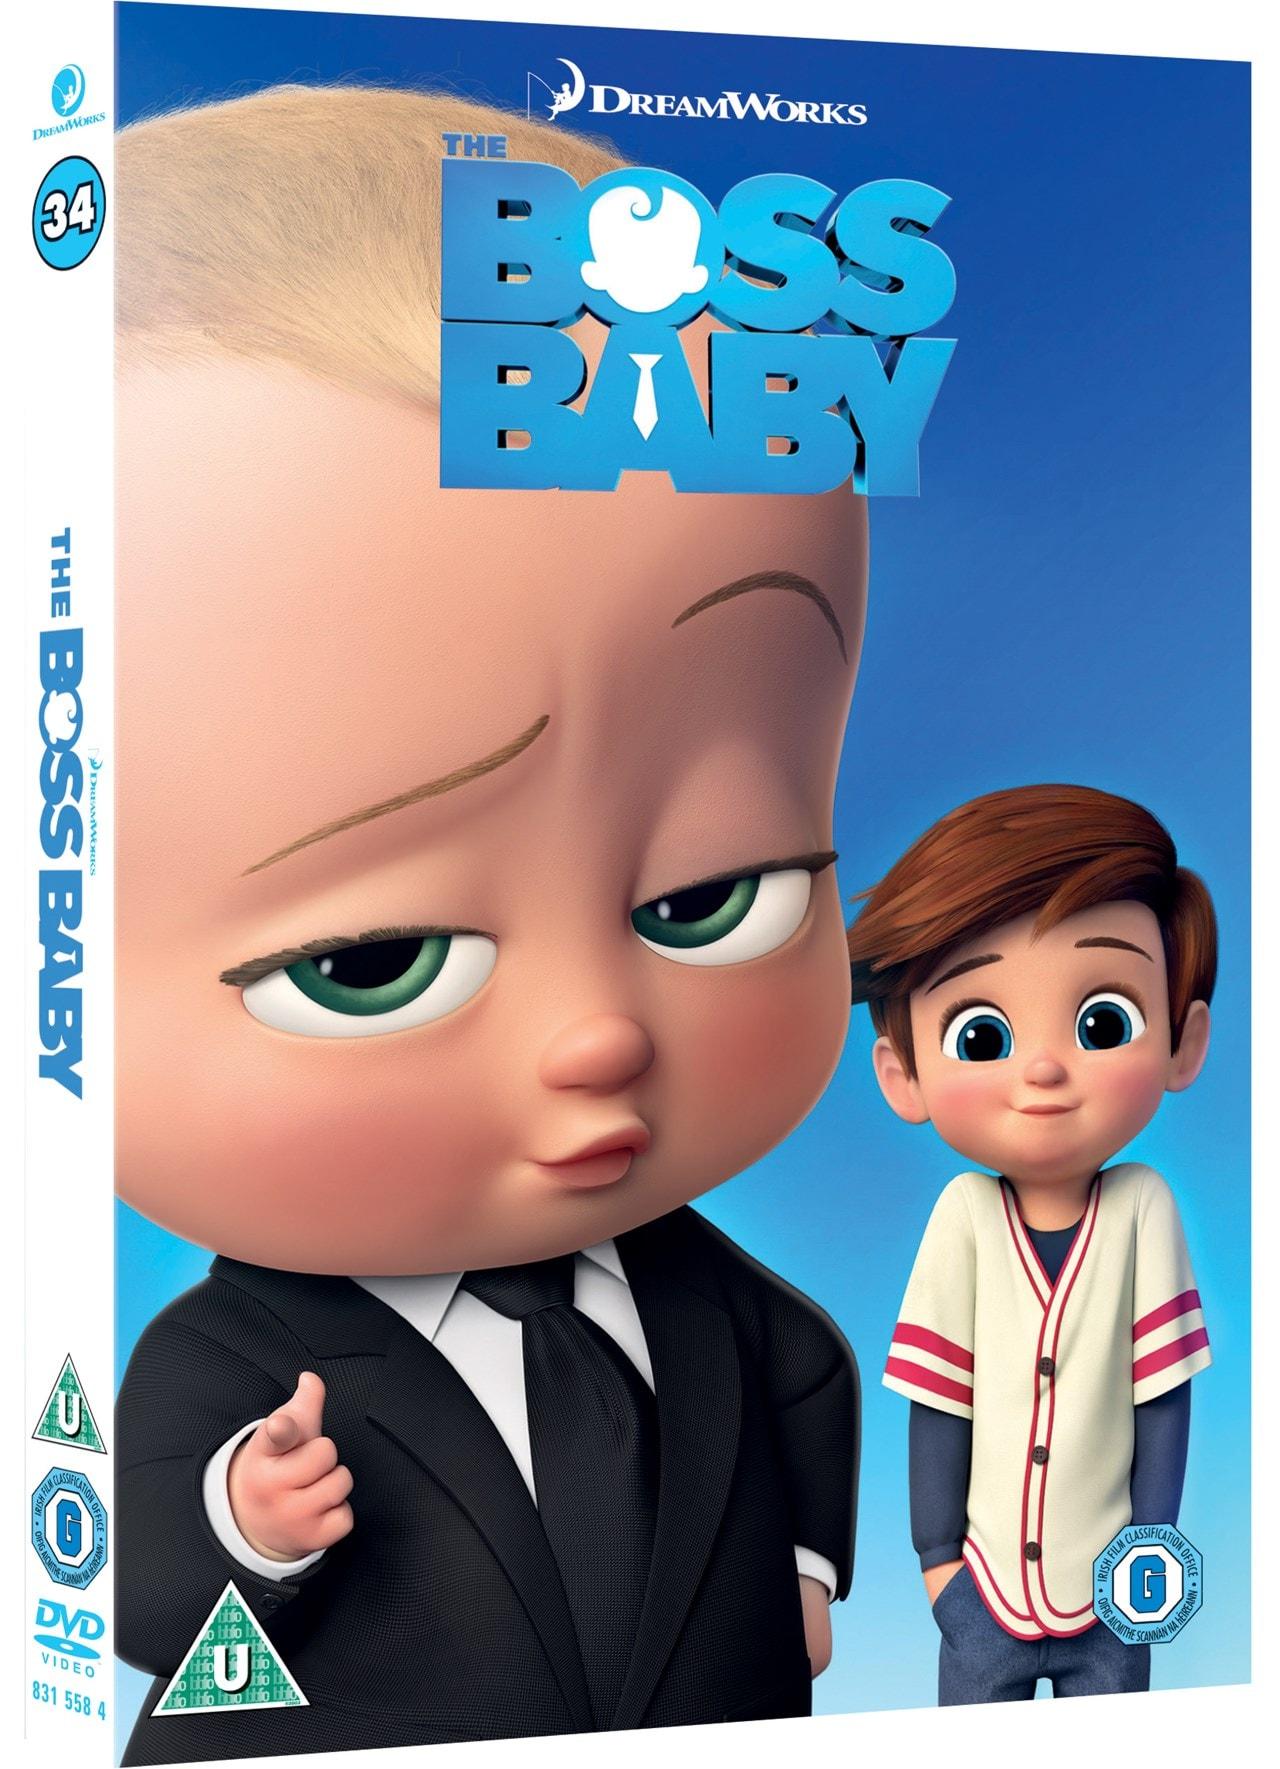 The Boss Baby - 2